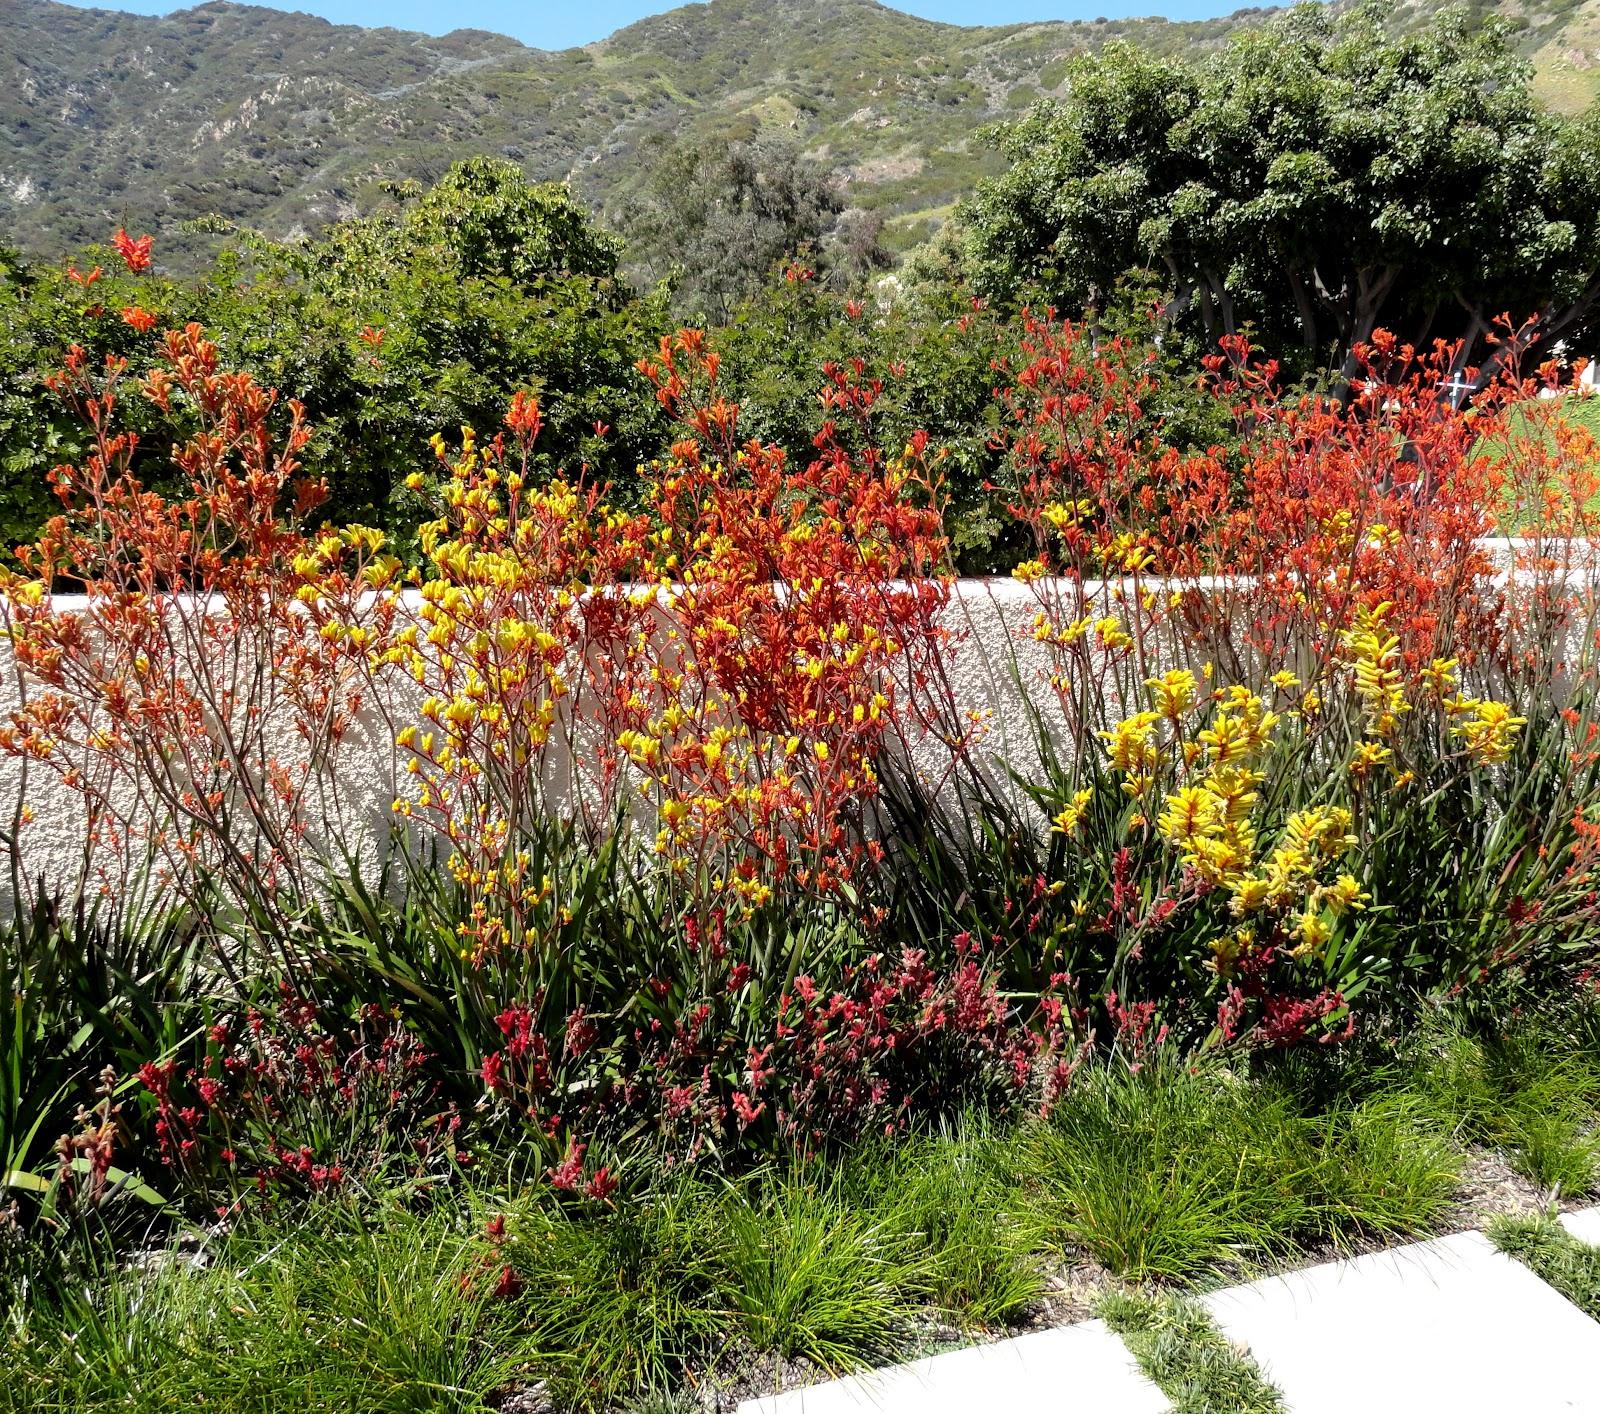 danger garden: The Heroes Garden at Pepperdine University